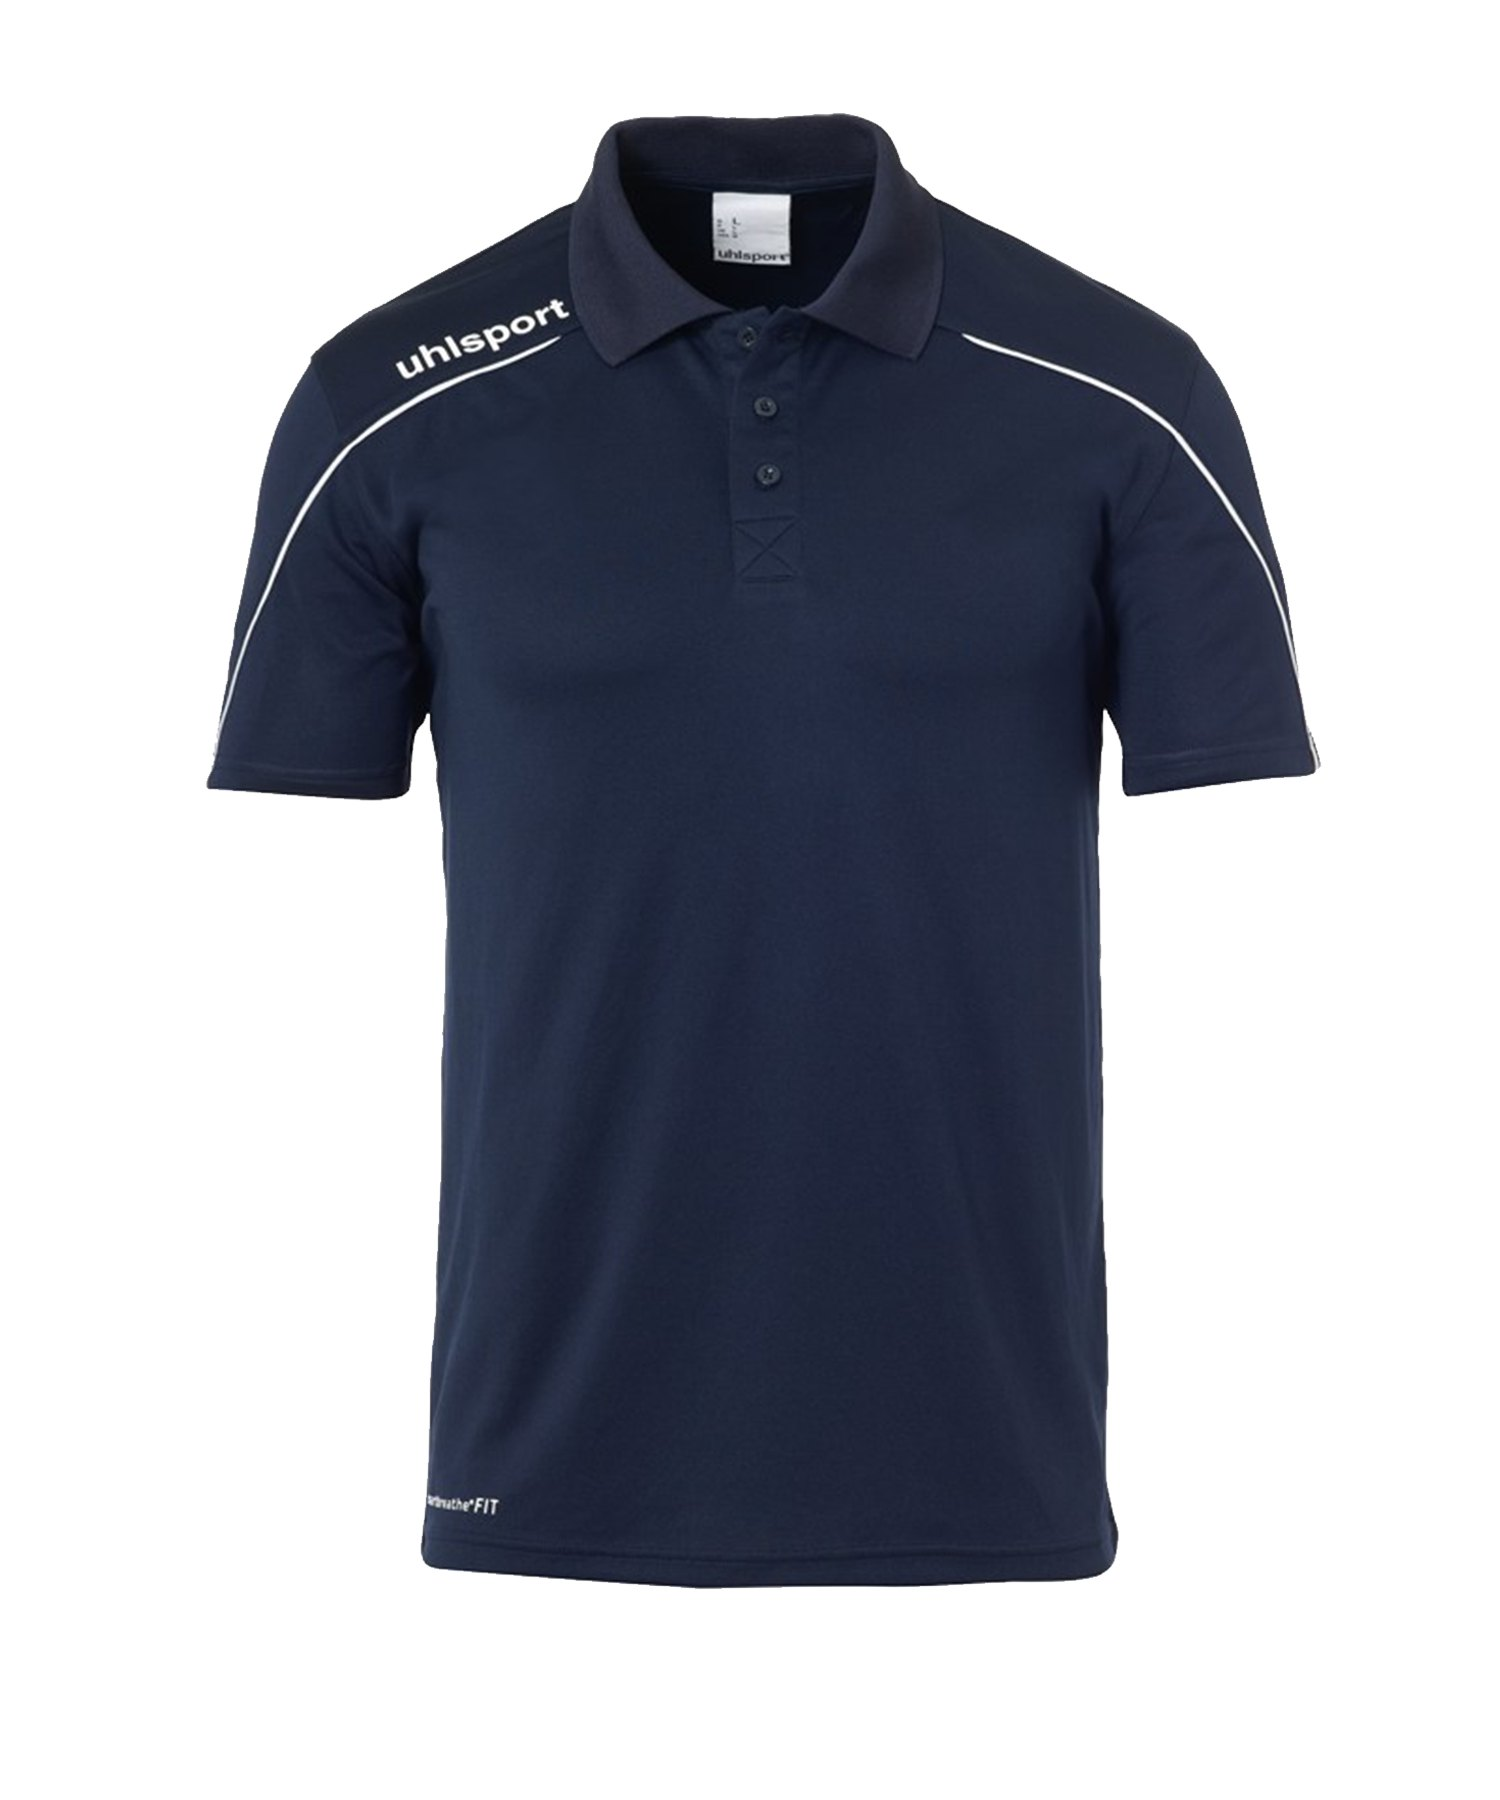 Uhlsport Stream 22 Poloshirt Kids Blau Weiss F12 - Blau